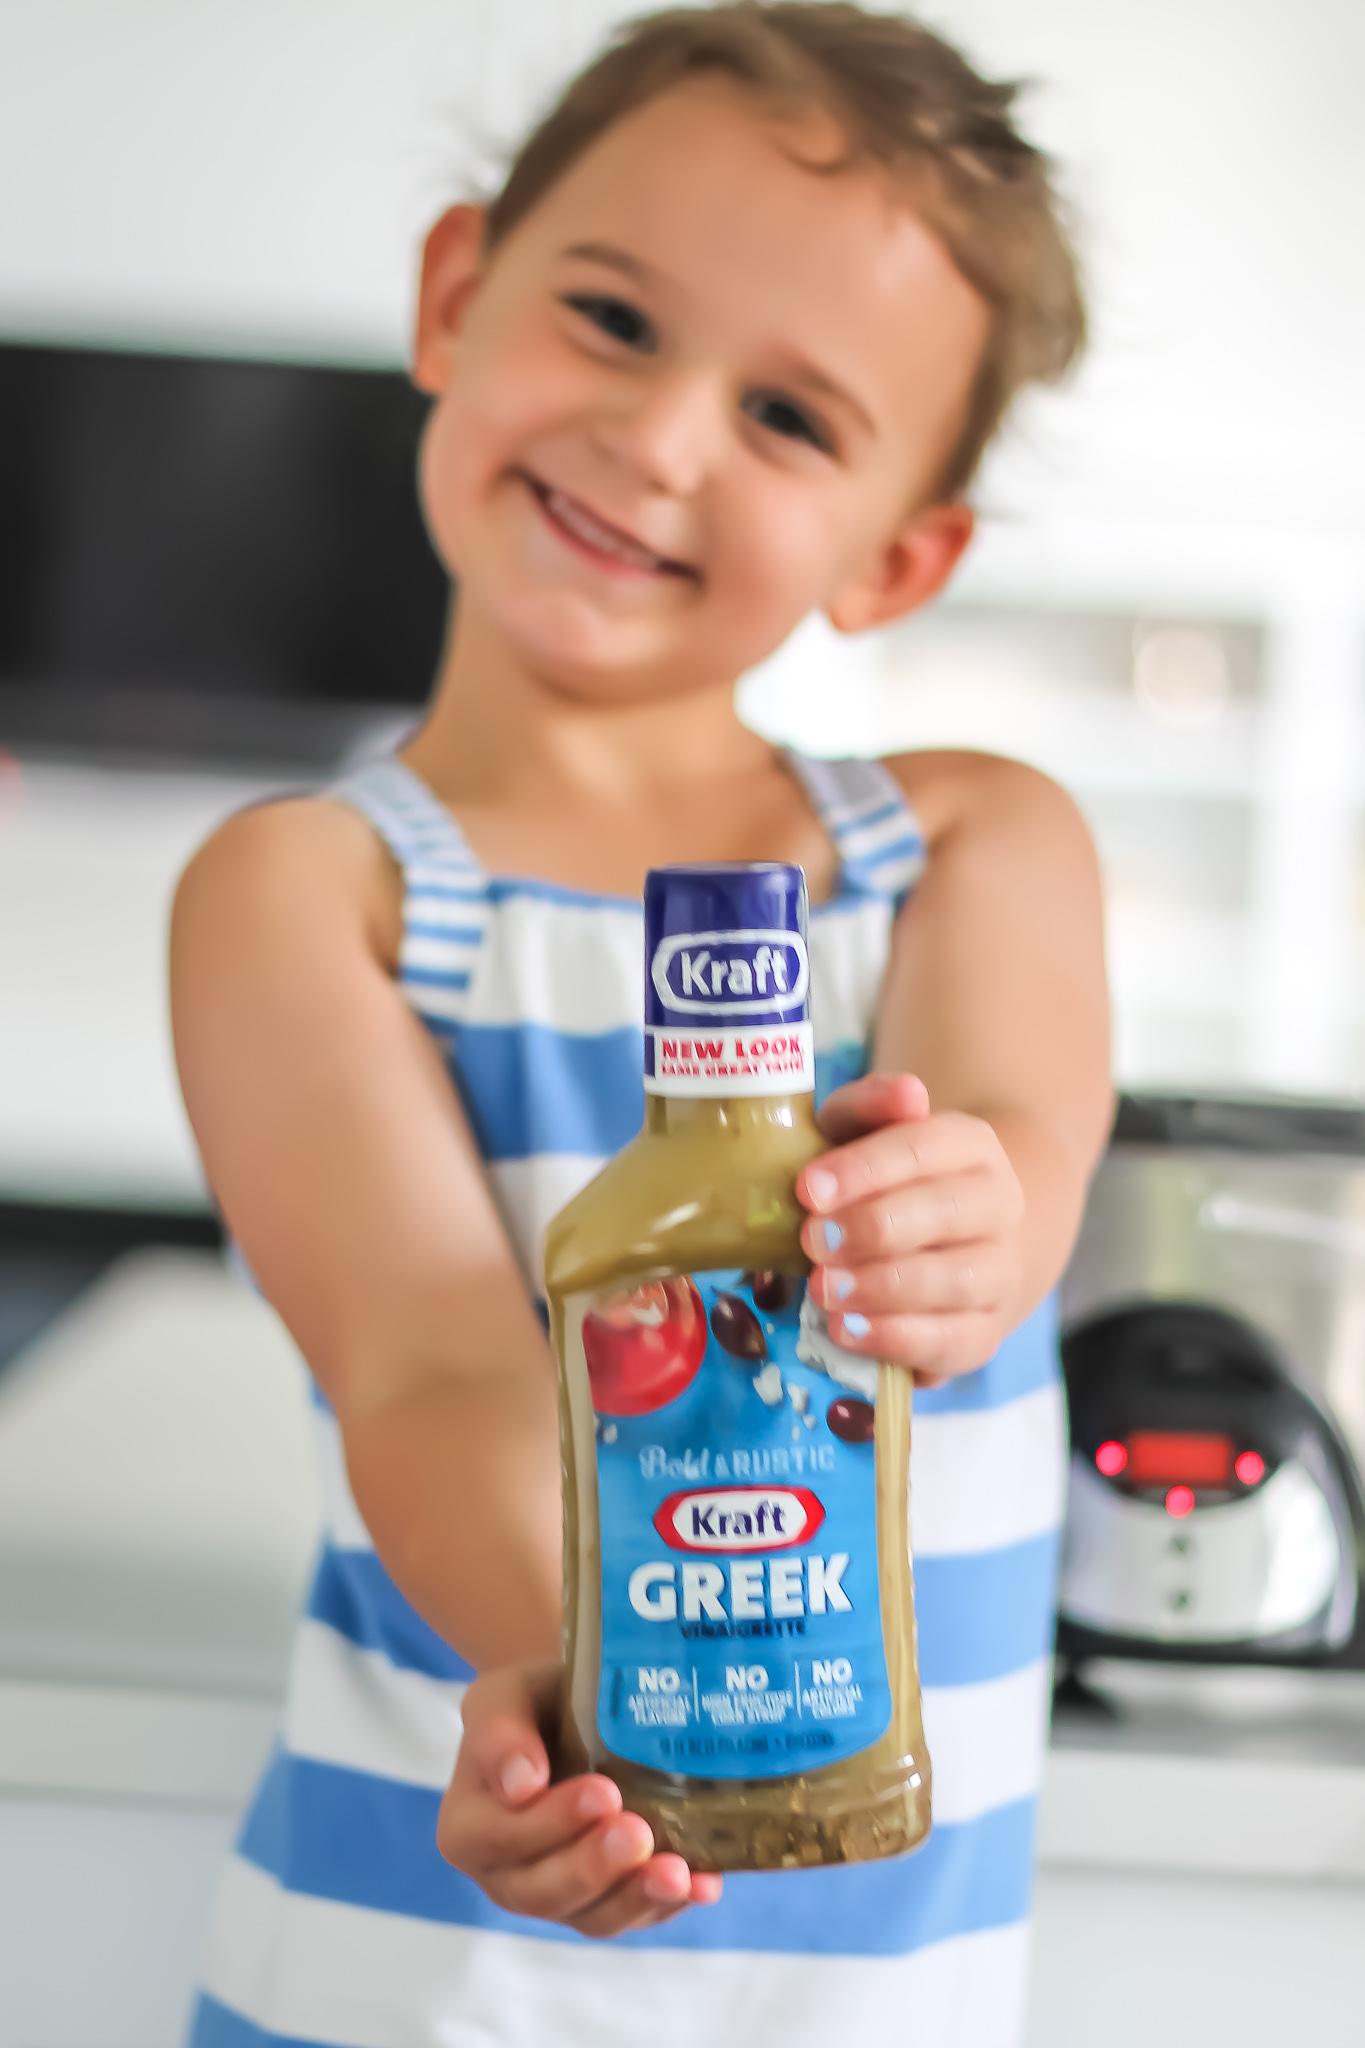 kraft greek chicken vinaigrette